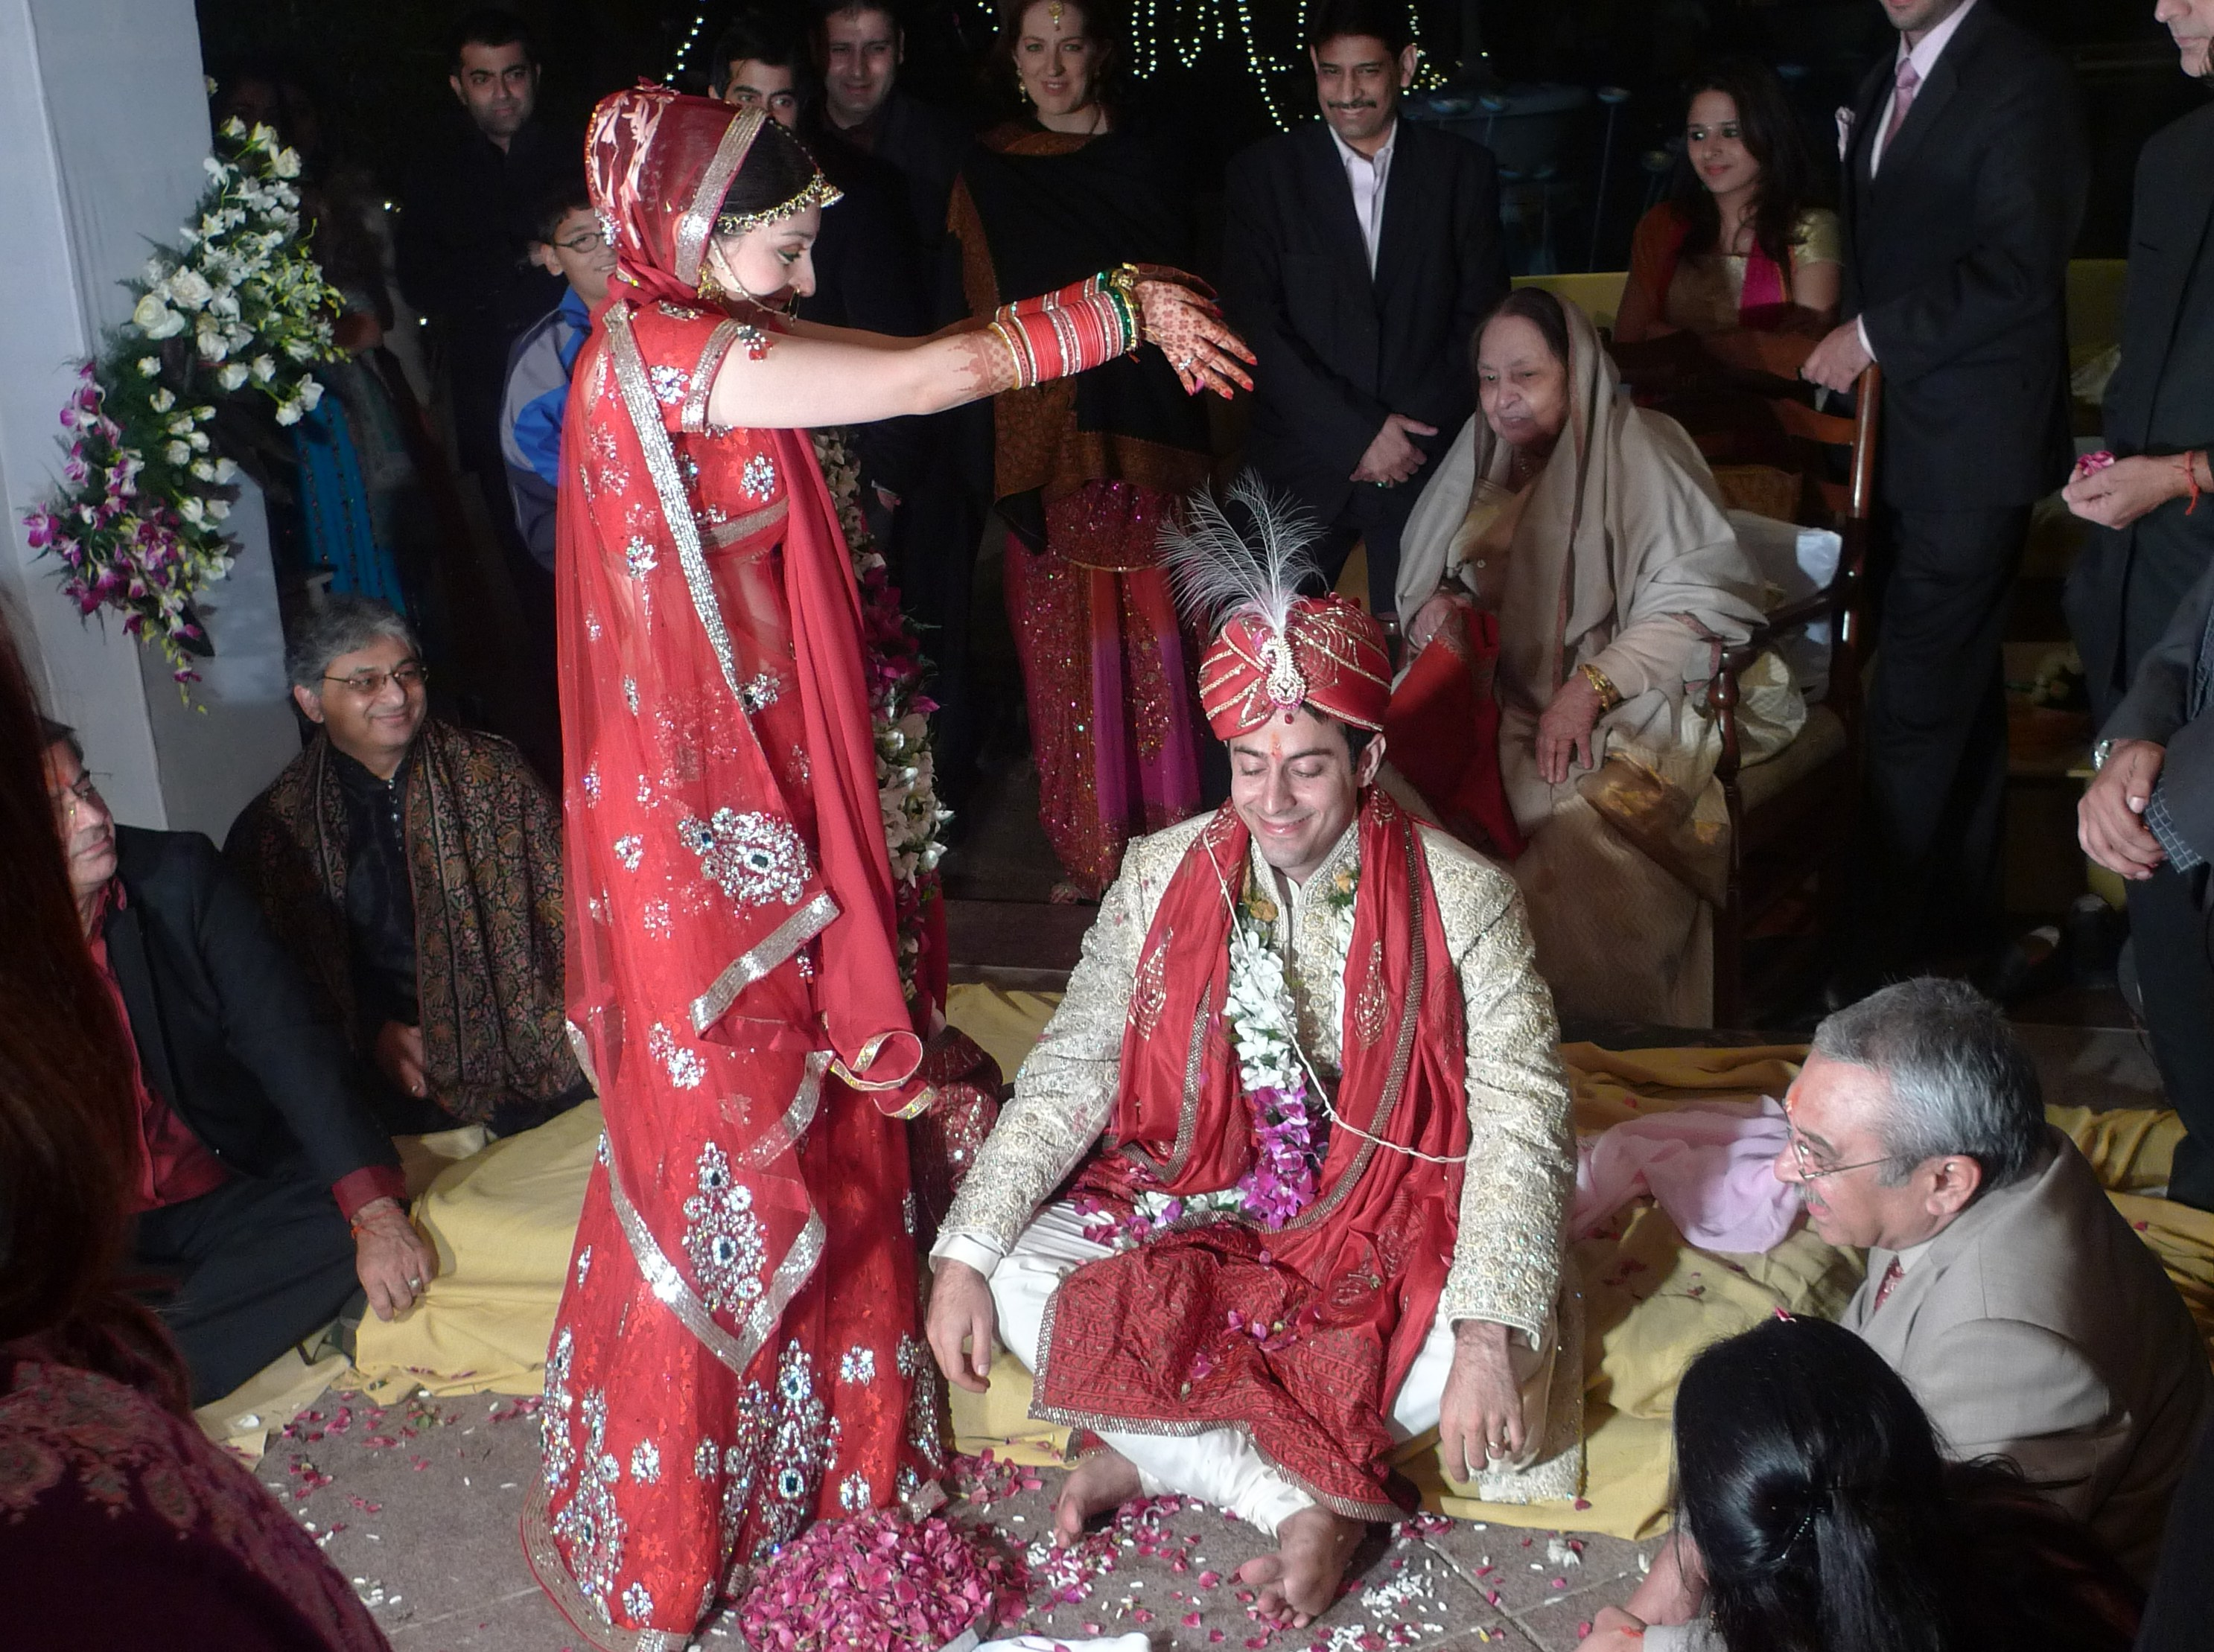 Inspirasi Contoh Gaun Pengantin Muslimah Bqdd Wedding